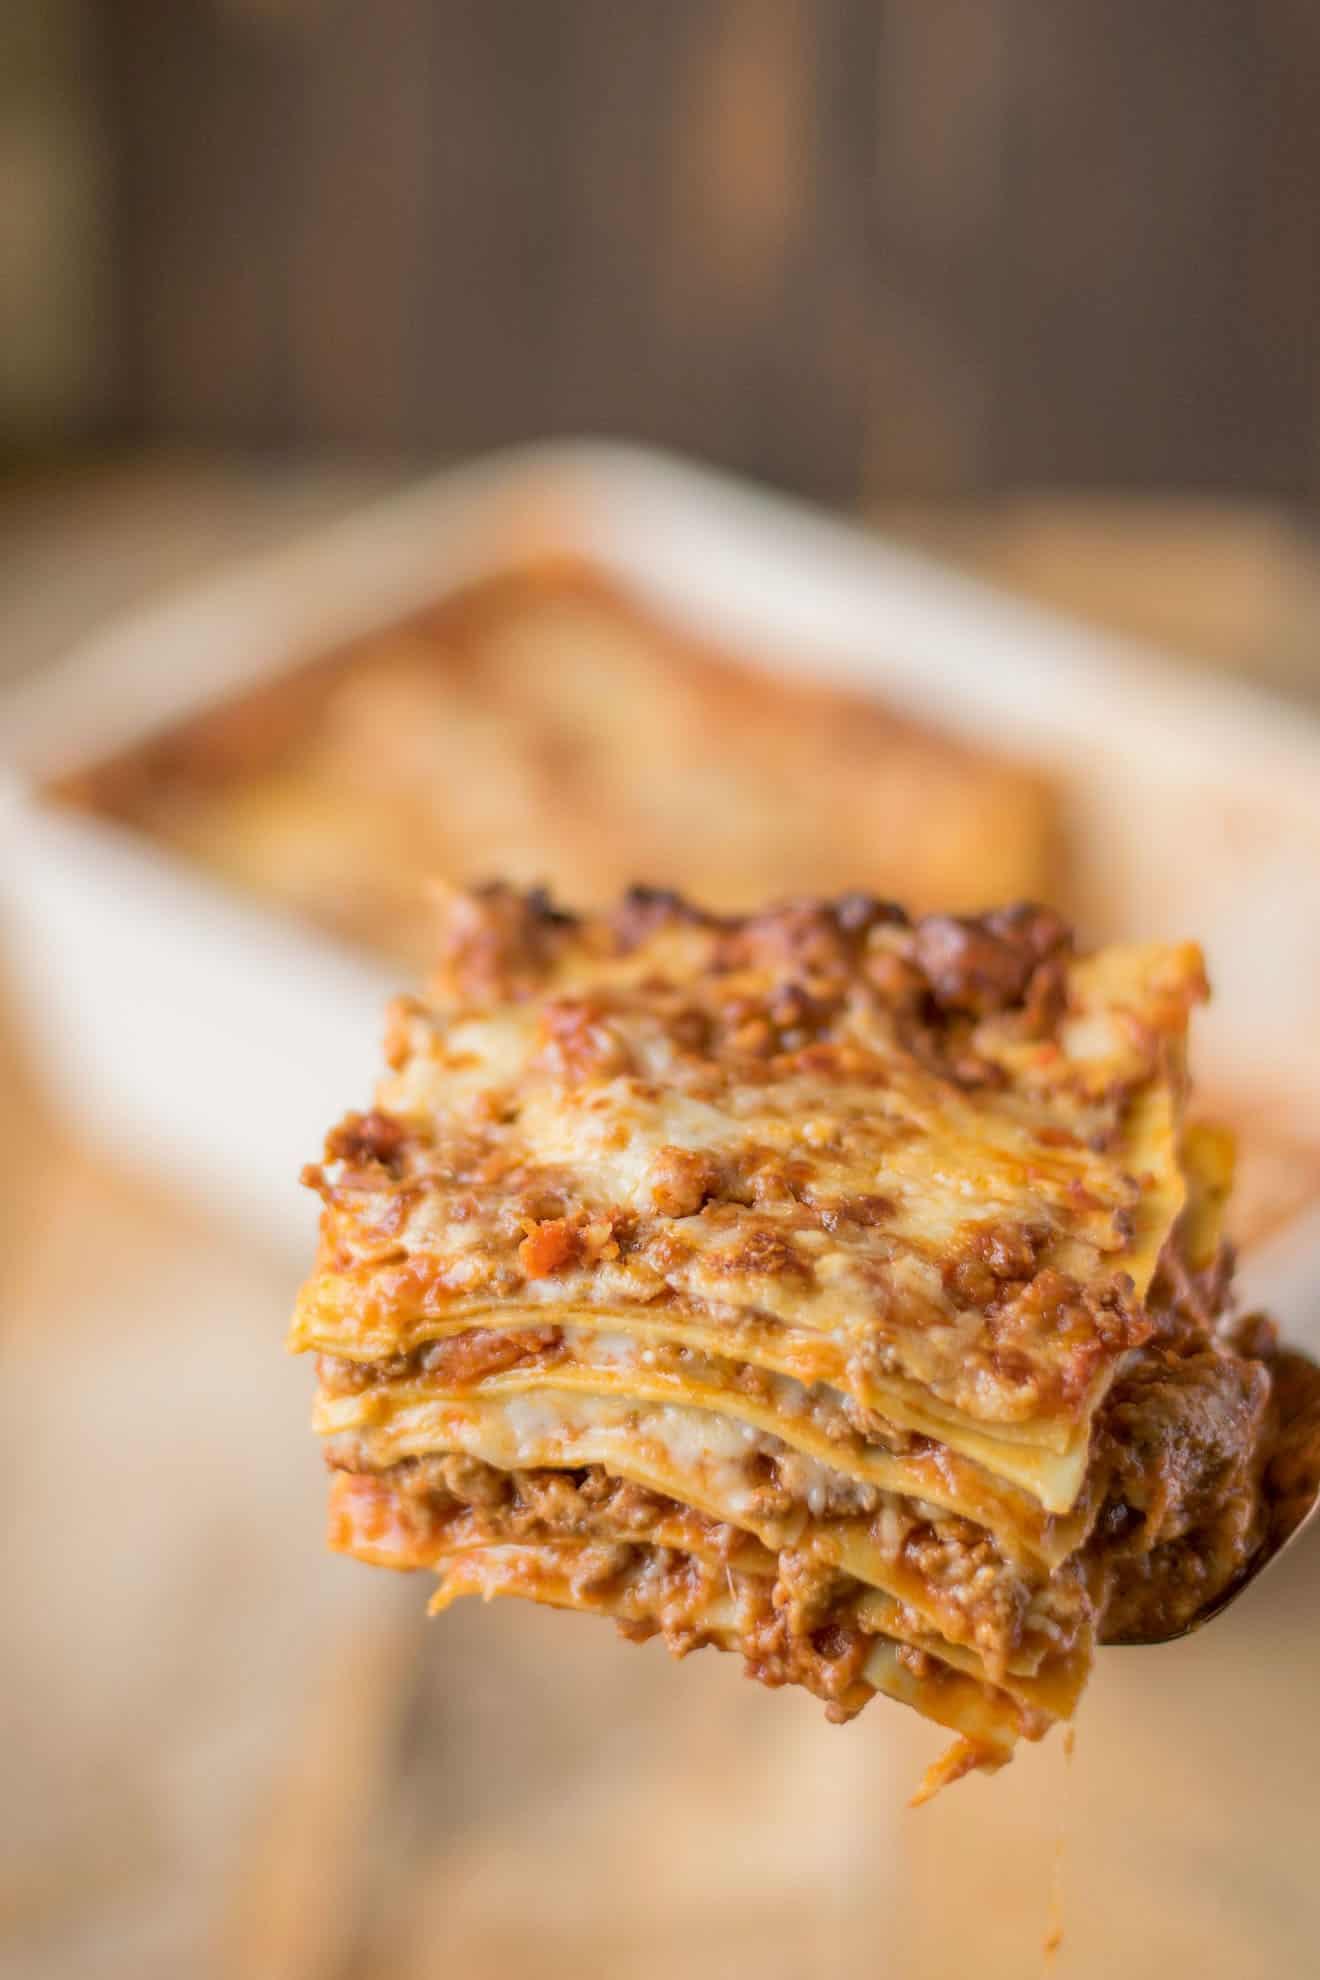 A multi-layered square of Lasagna Bolognese